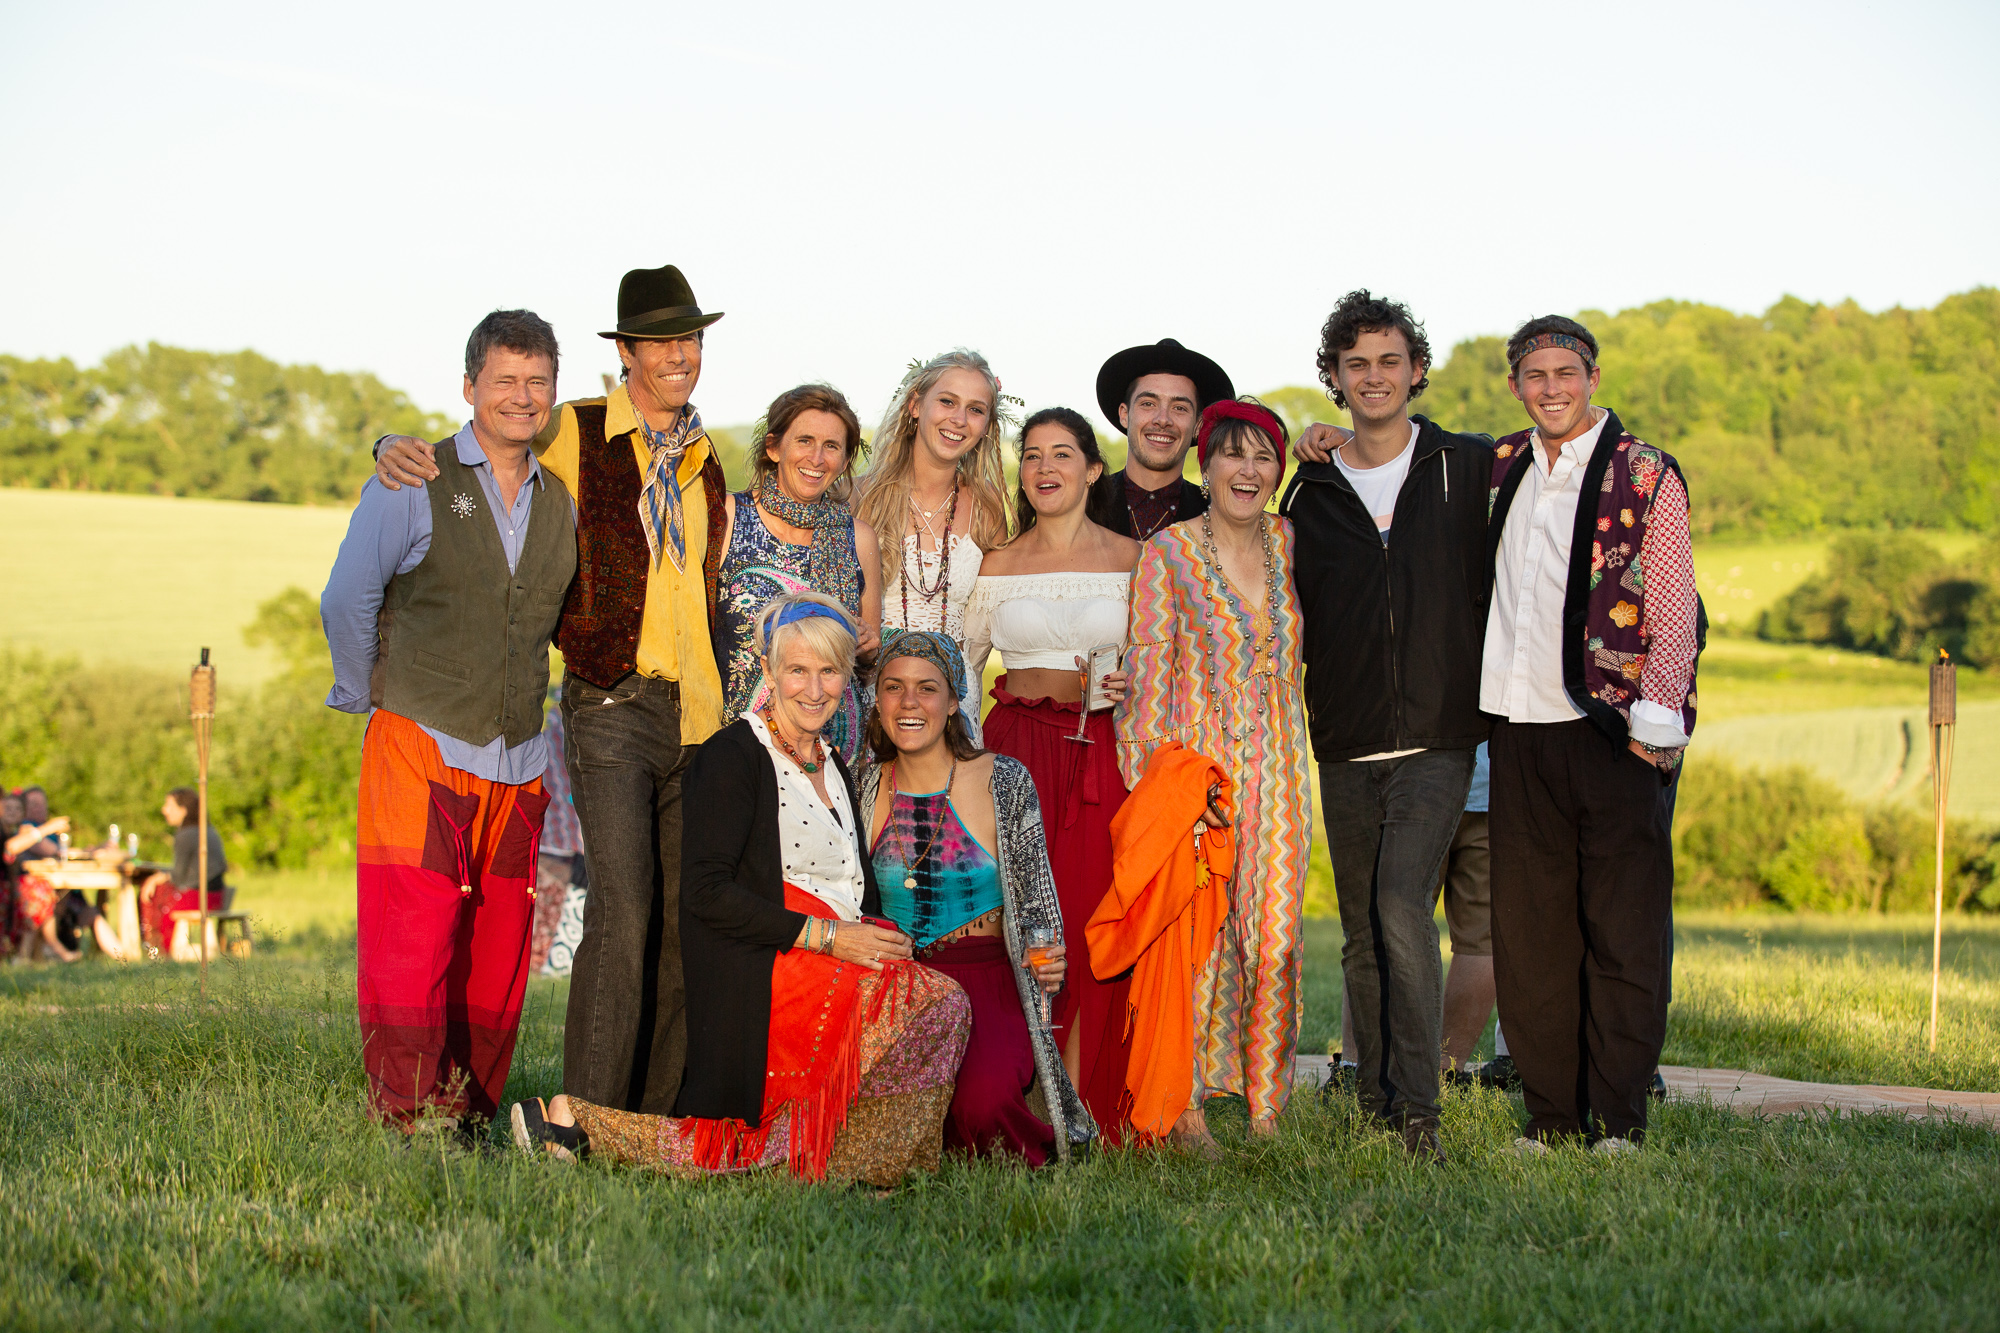 Family_Group_Portrait_West_Sussex_Wedding_Photographer_Rachel_Thornhill